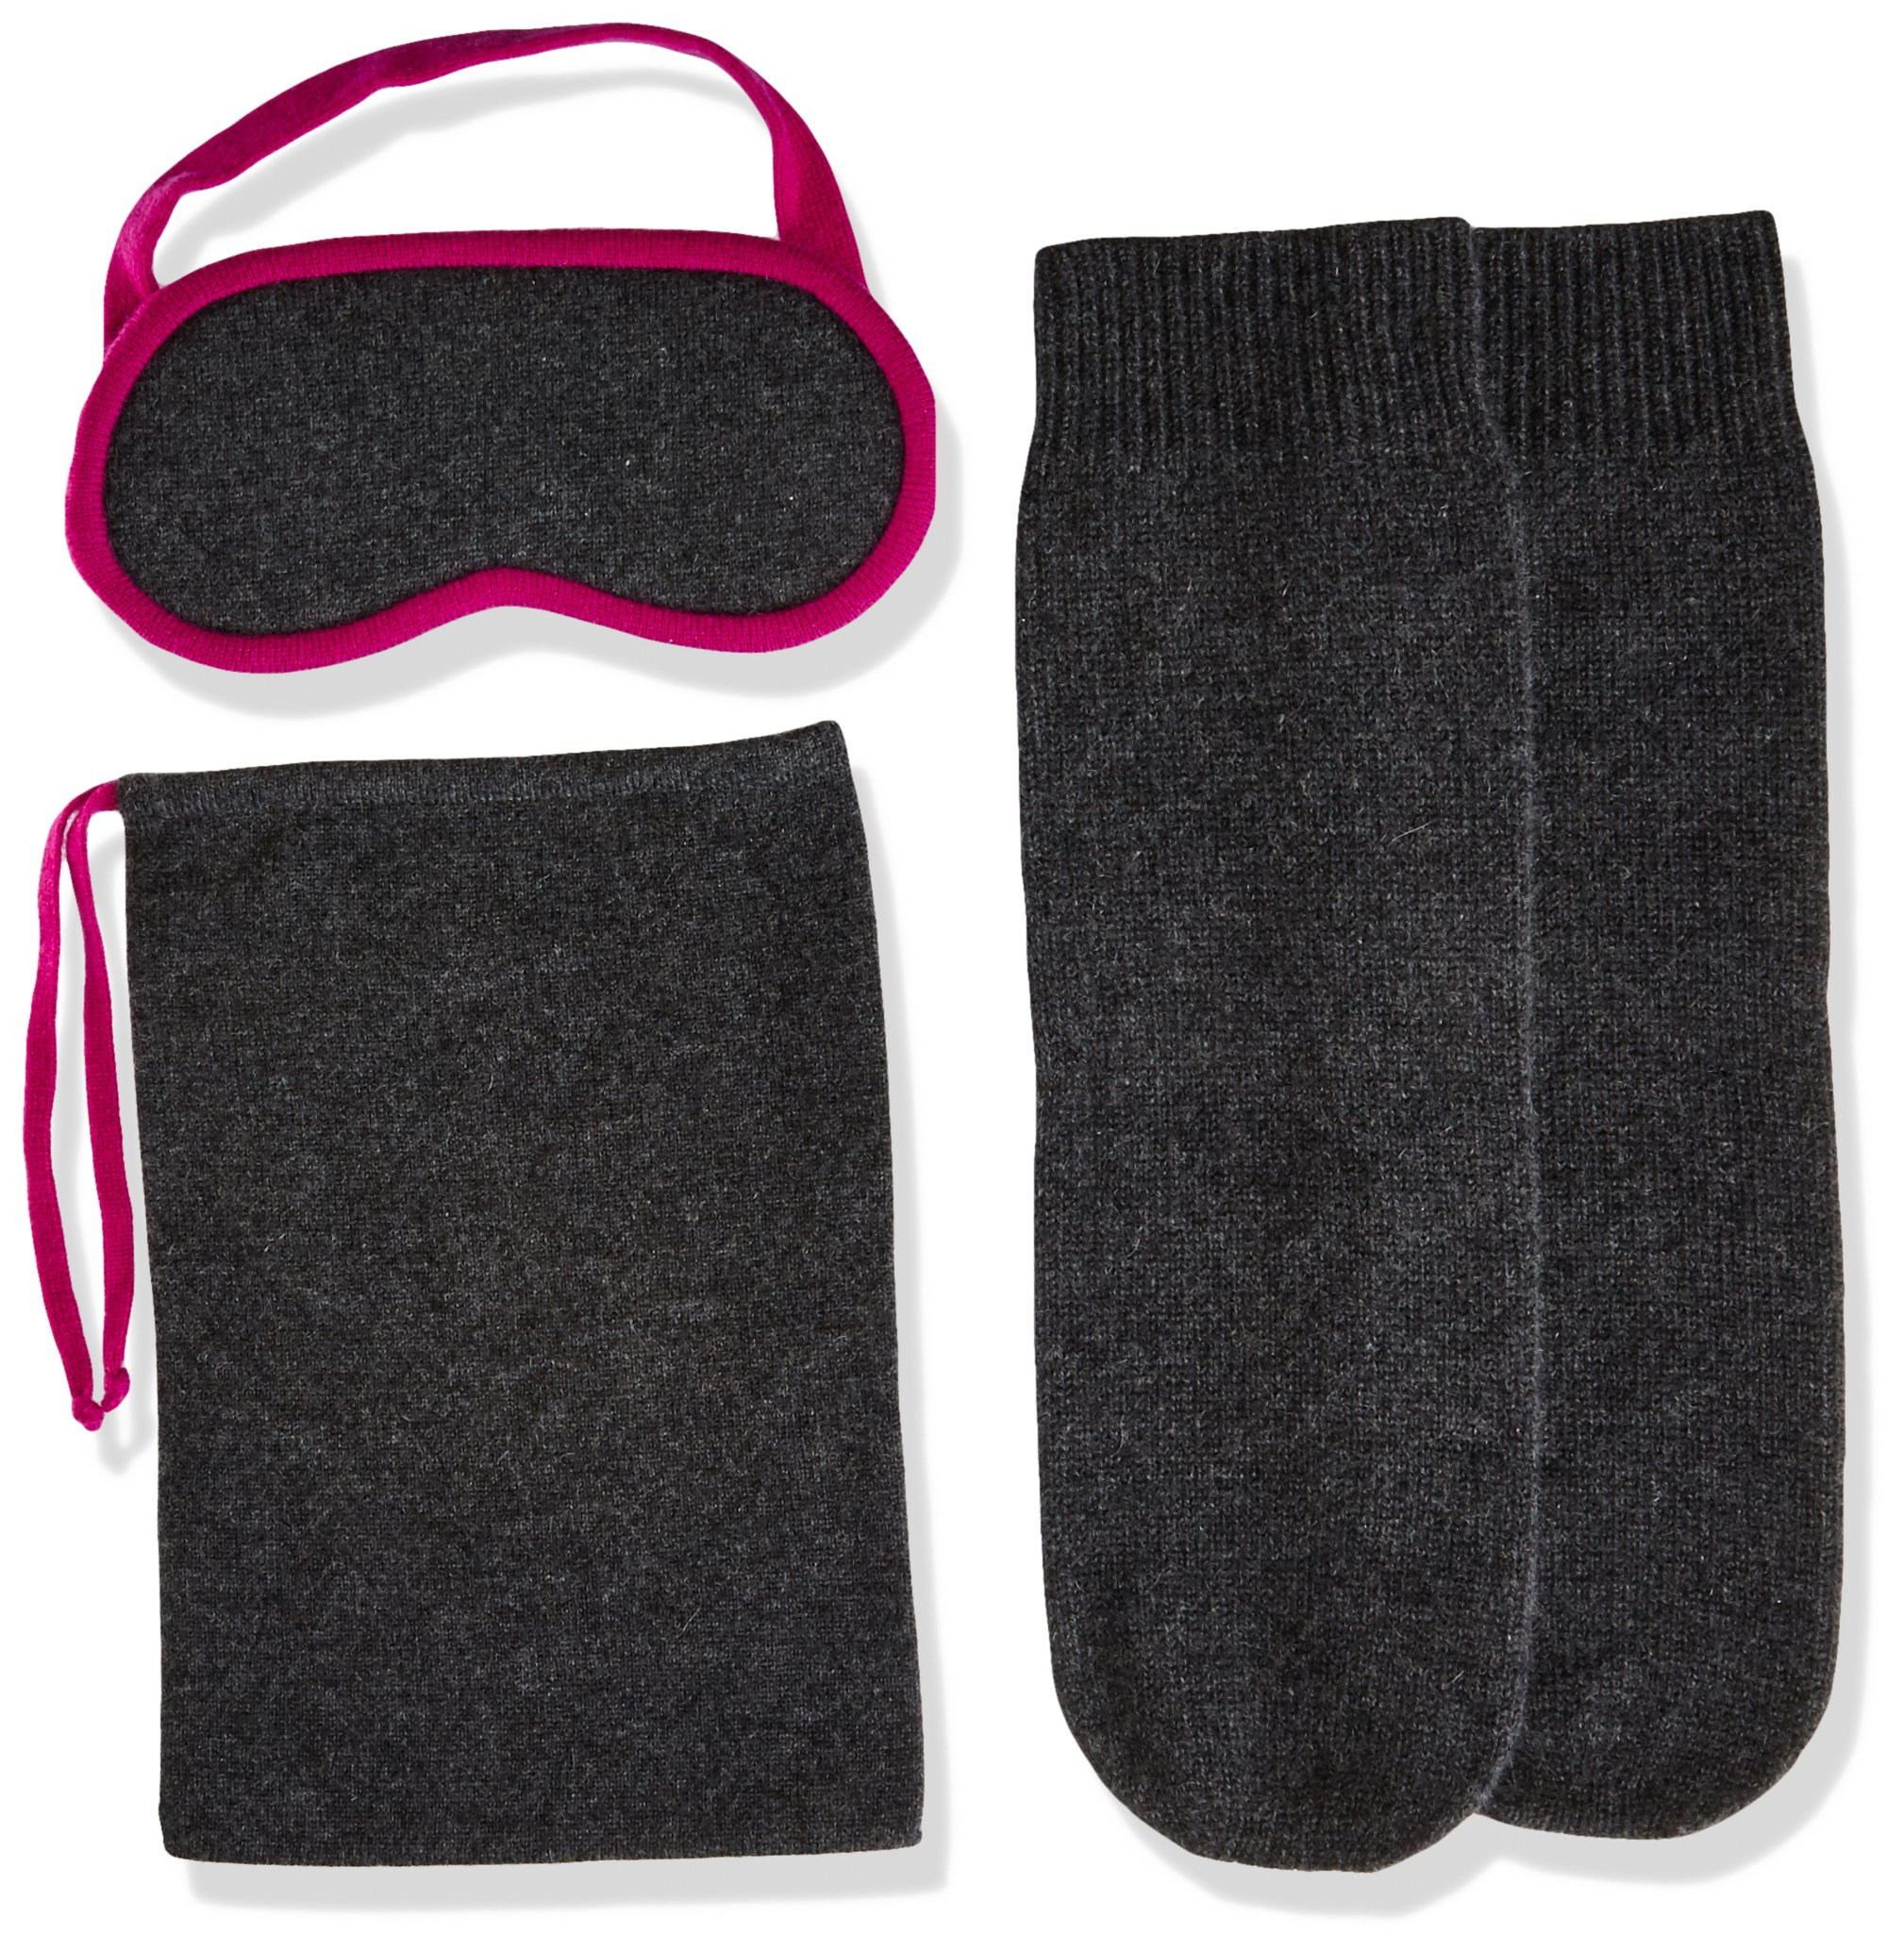 Sofia Cashmere Women's Cashmere Travel Set-Eyemask and Socks, Charocal ZY73186 + Magenta ZY62372, ONE